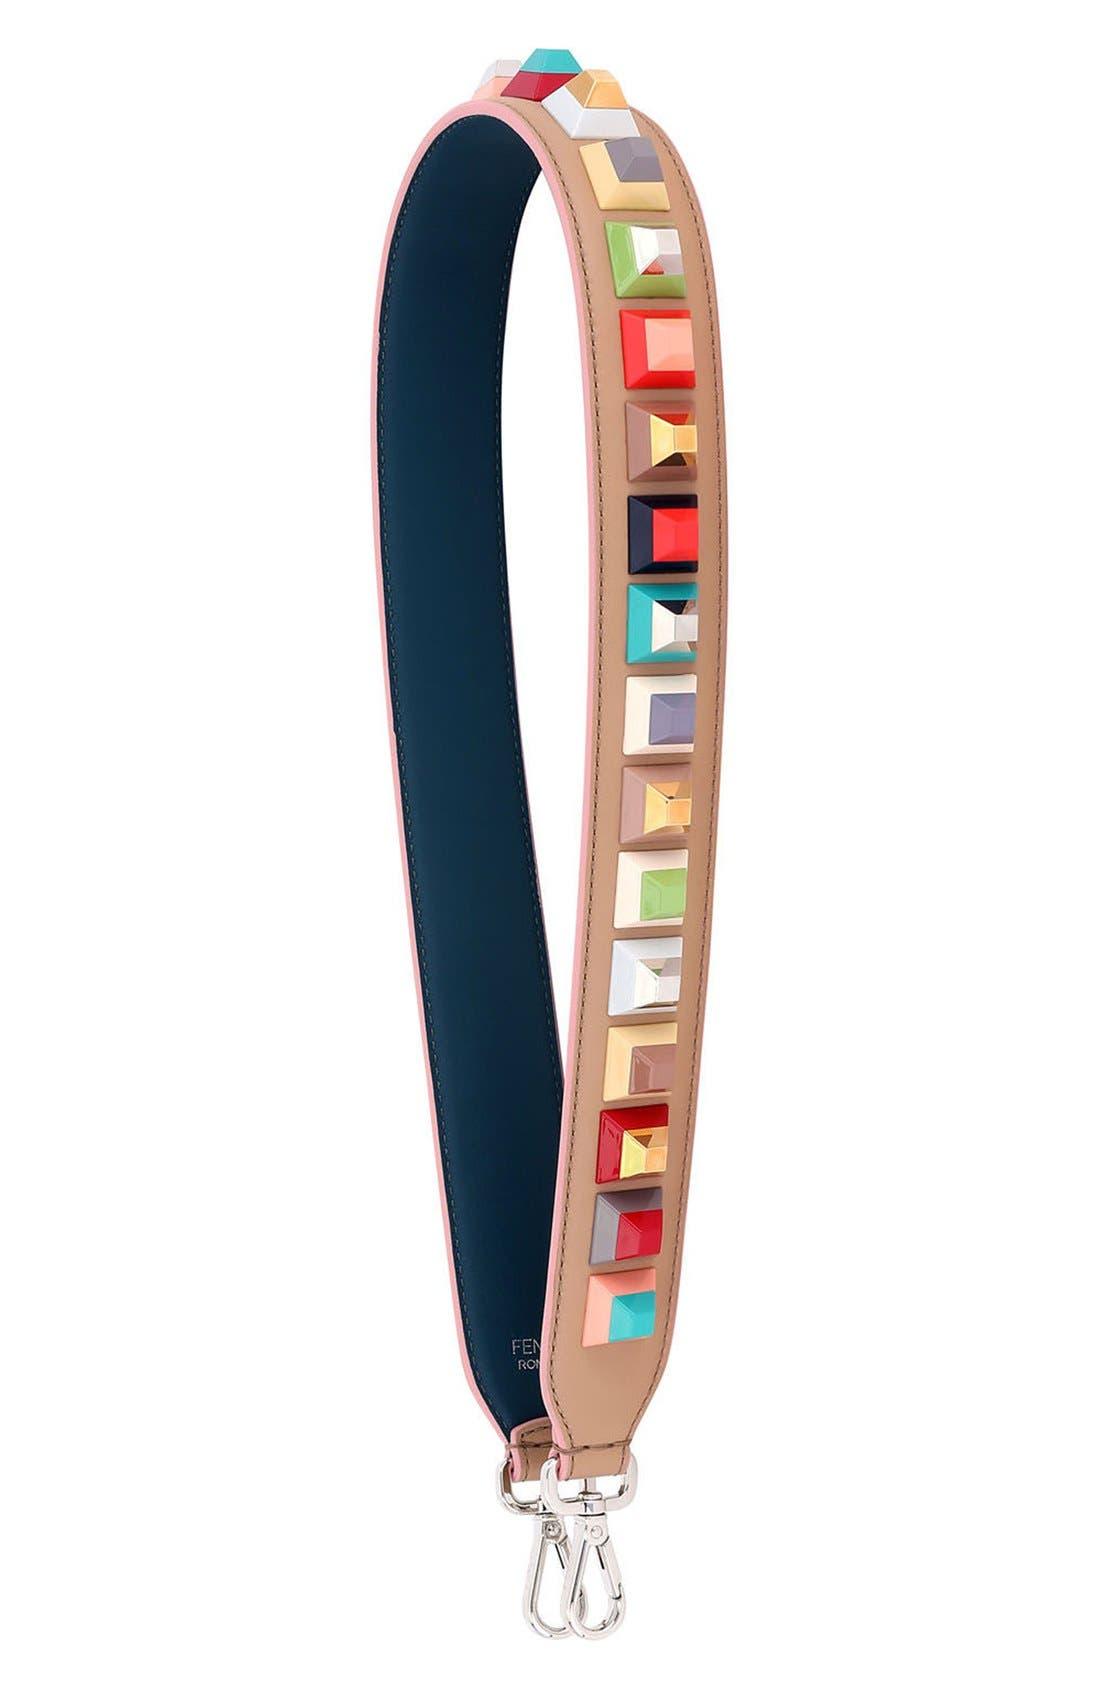 Main Image - Fendi Strap You Multi Rainbow Stud Leather Guitar Bag Strap